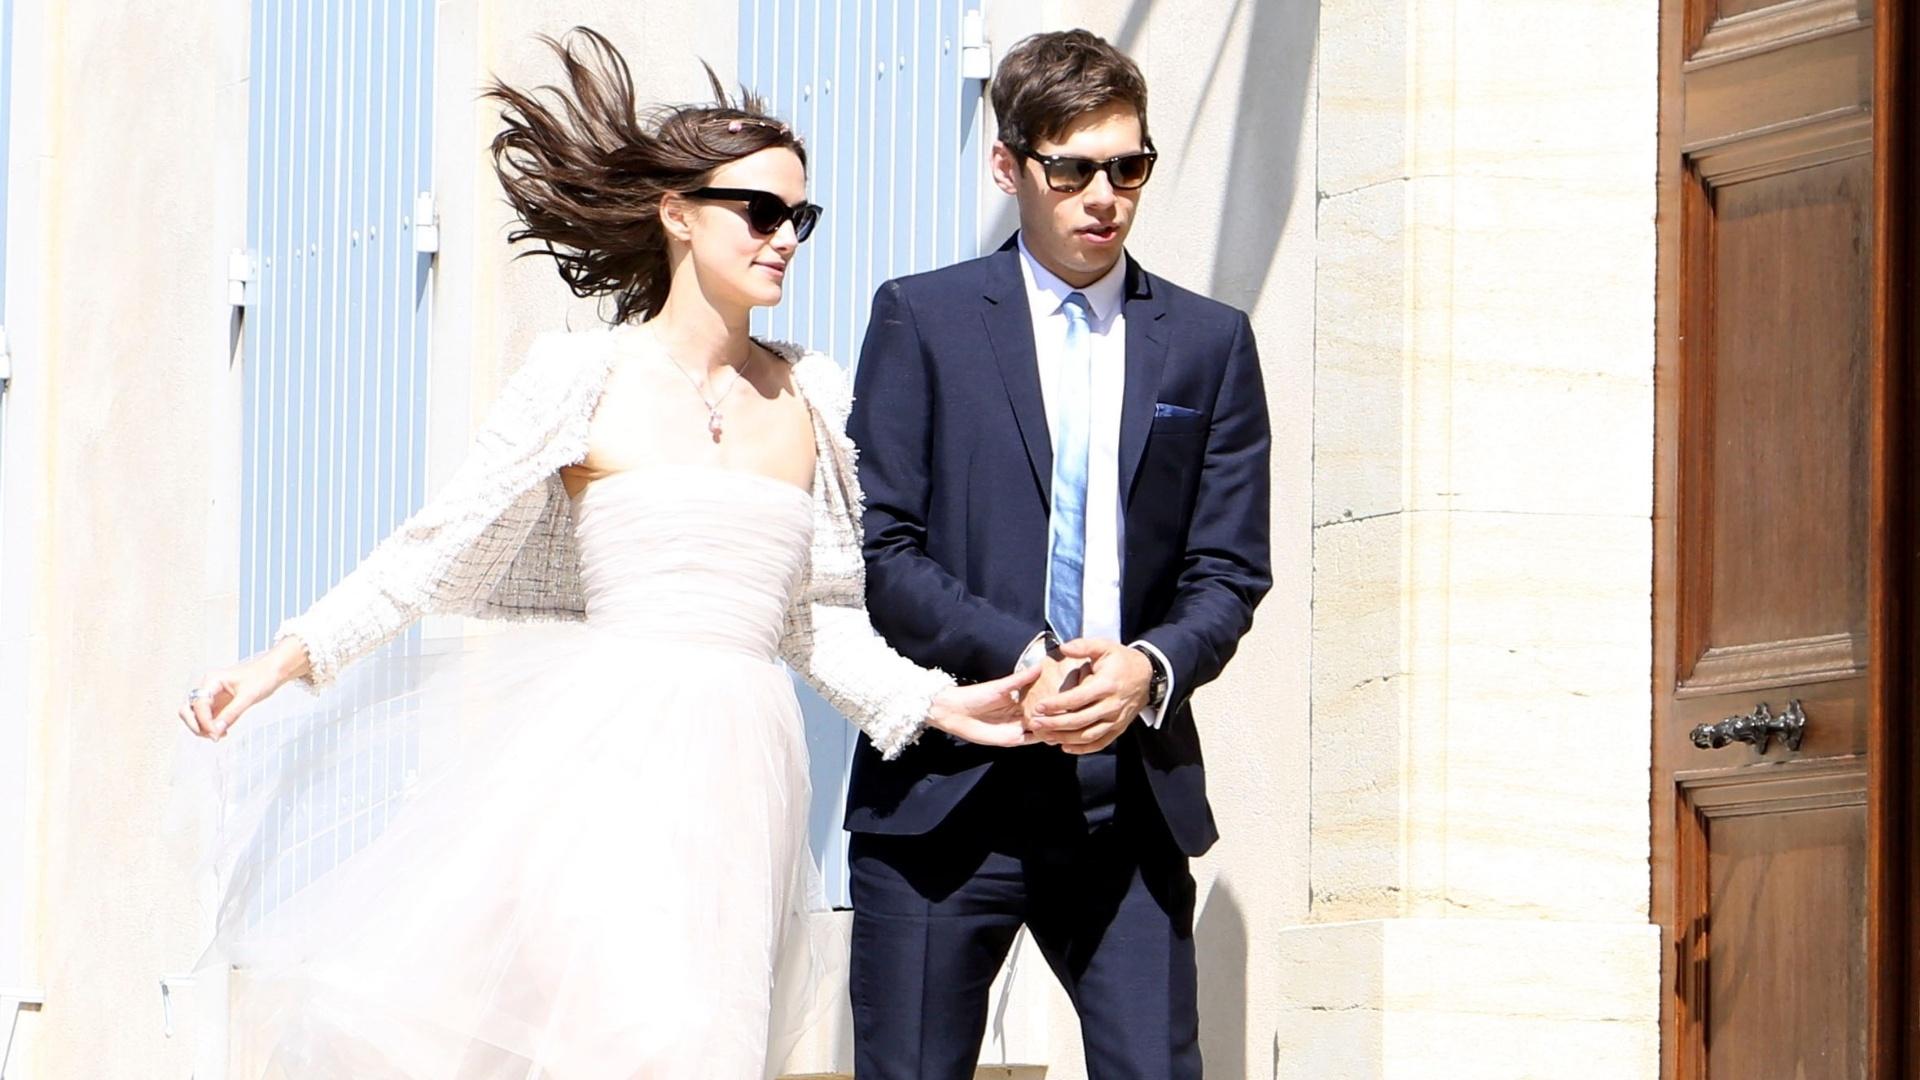 4.maio.2013 - Keira Knightley e James Righton se casam na cidade de Mazan, na França